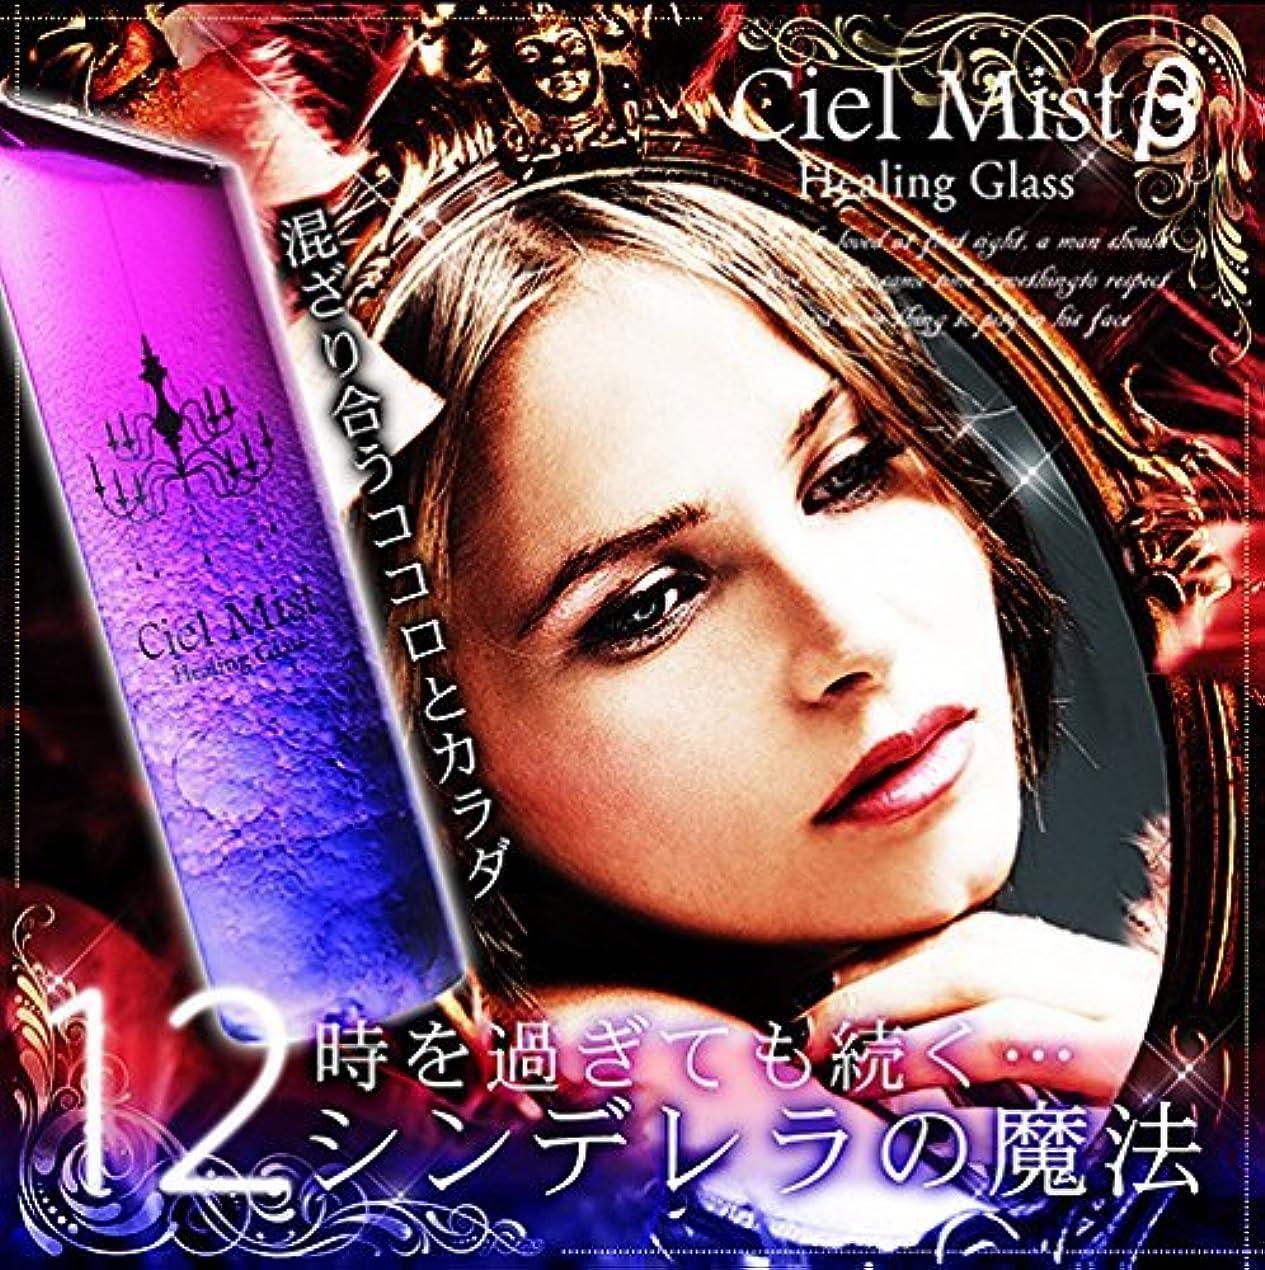 Ciel Mistβ- Healing Glass - シエルミストベータ